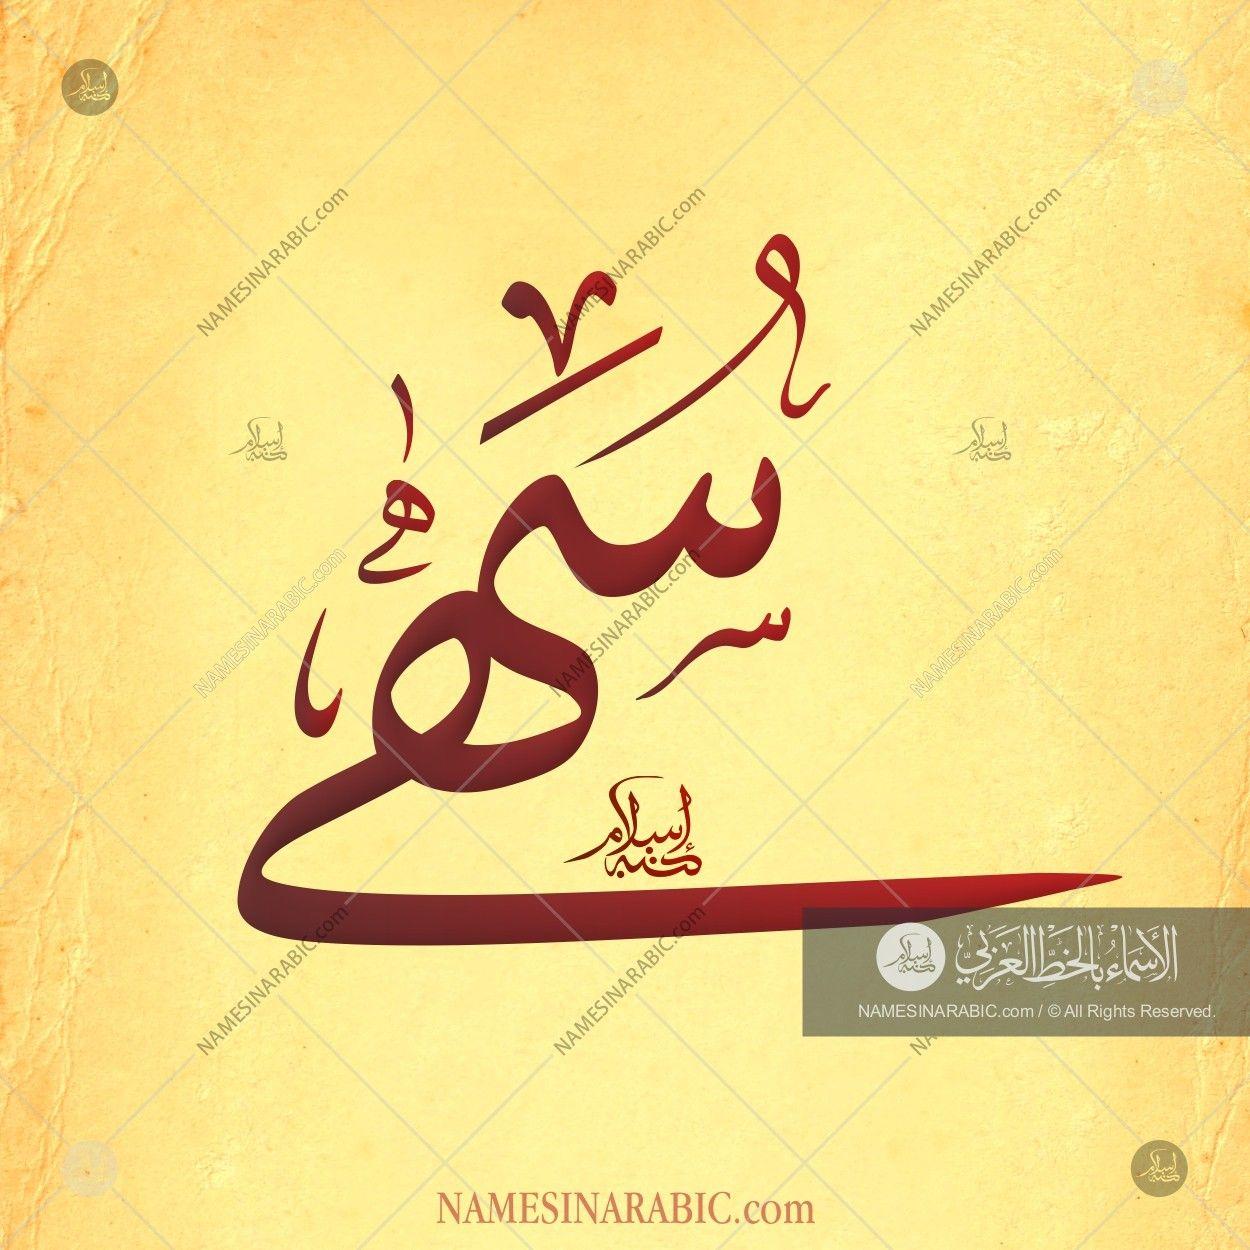 Suha Name In Arabic Calligraphy Calligraphy Calligraphy Name Calligraphy Art